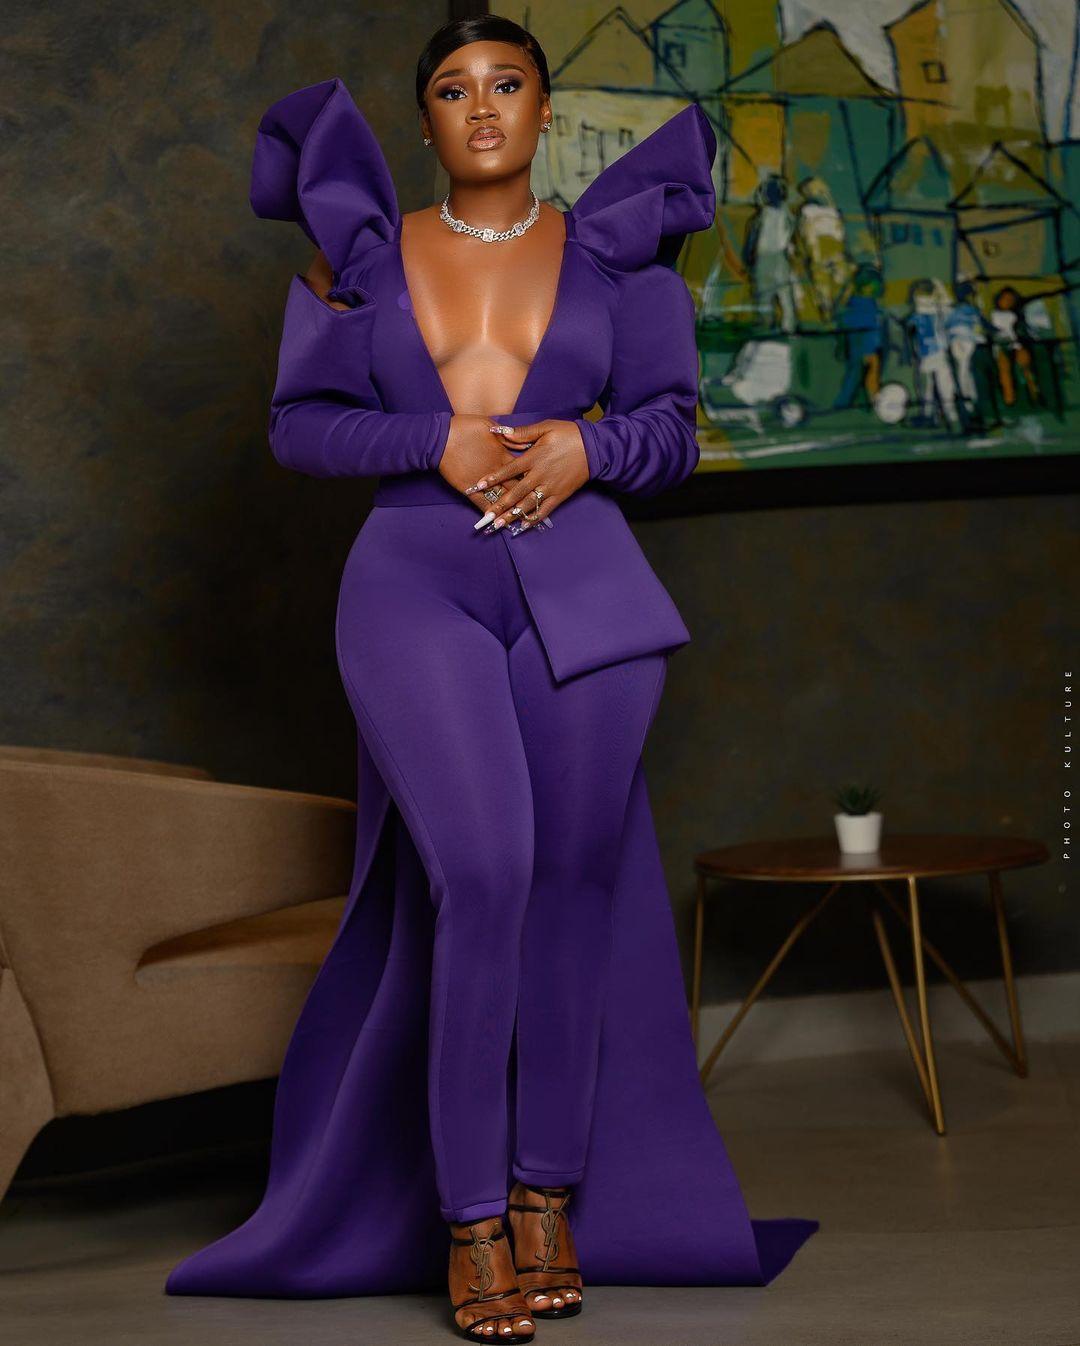 Cynthia Nwadiora: Stylish One Piece Outfit